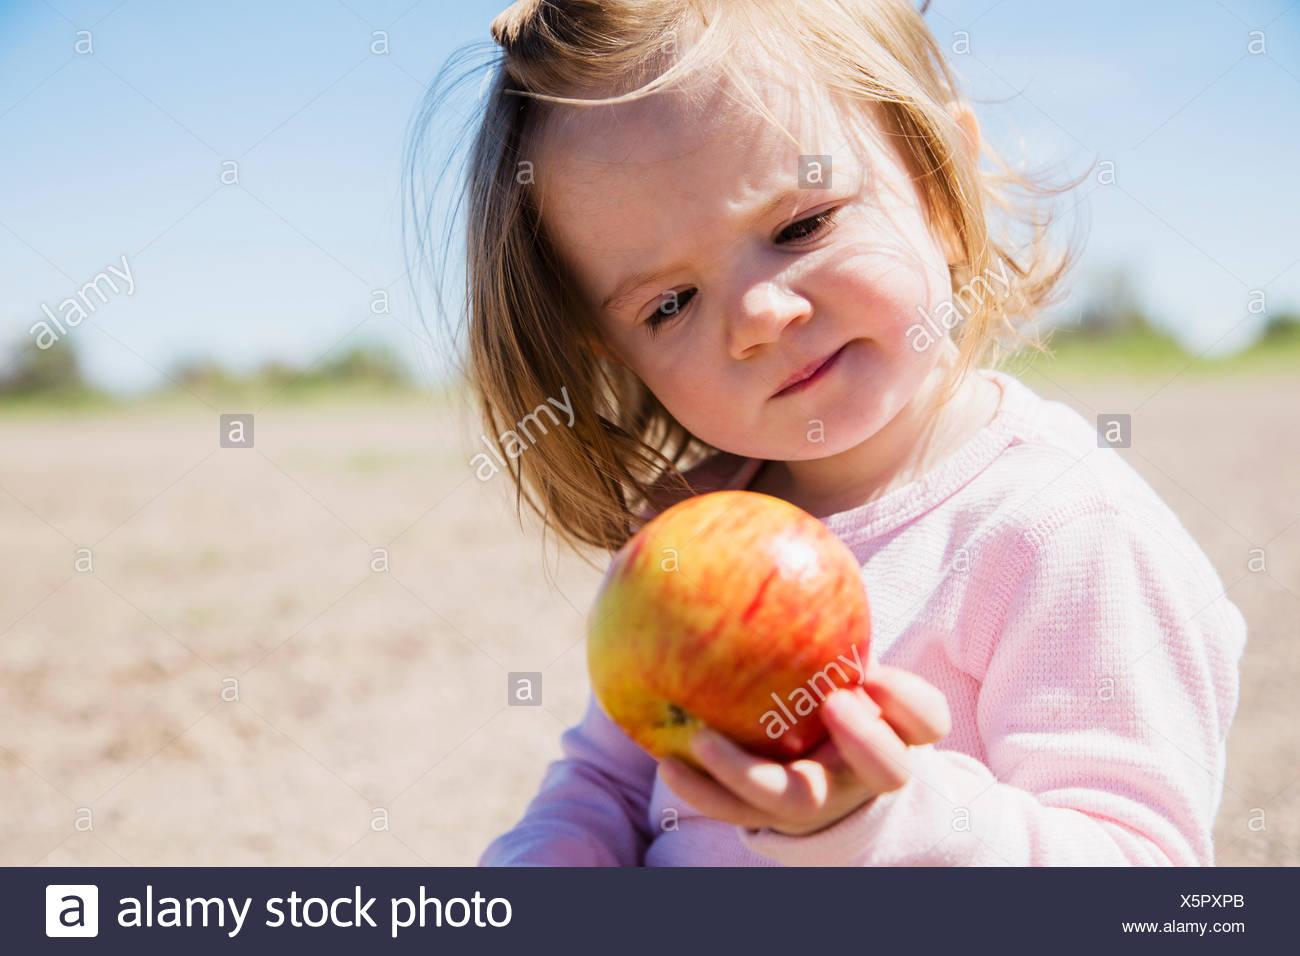 Portrait of Girl (2-3) holding apple Photo Stock